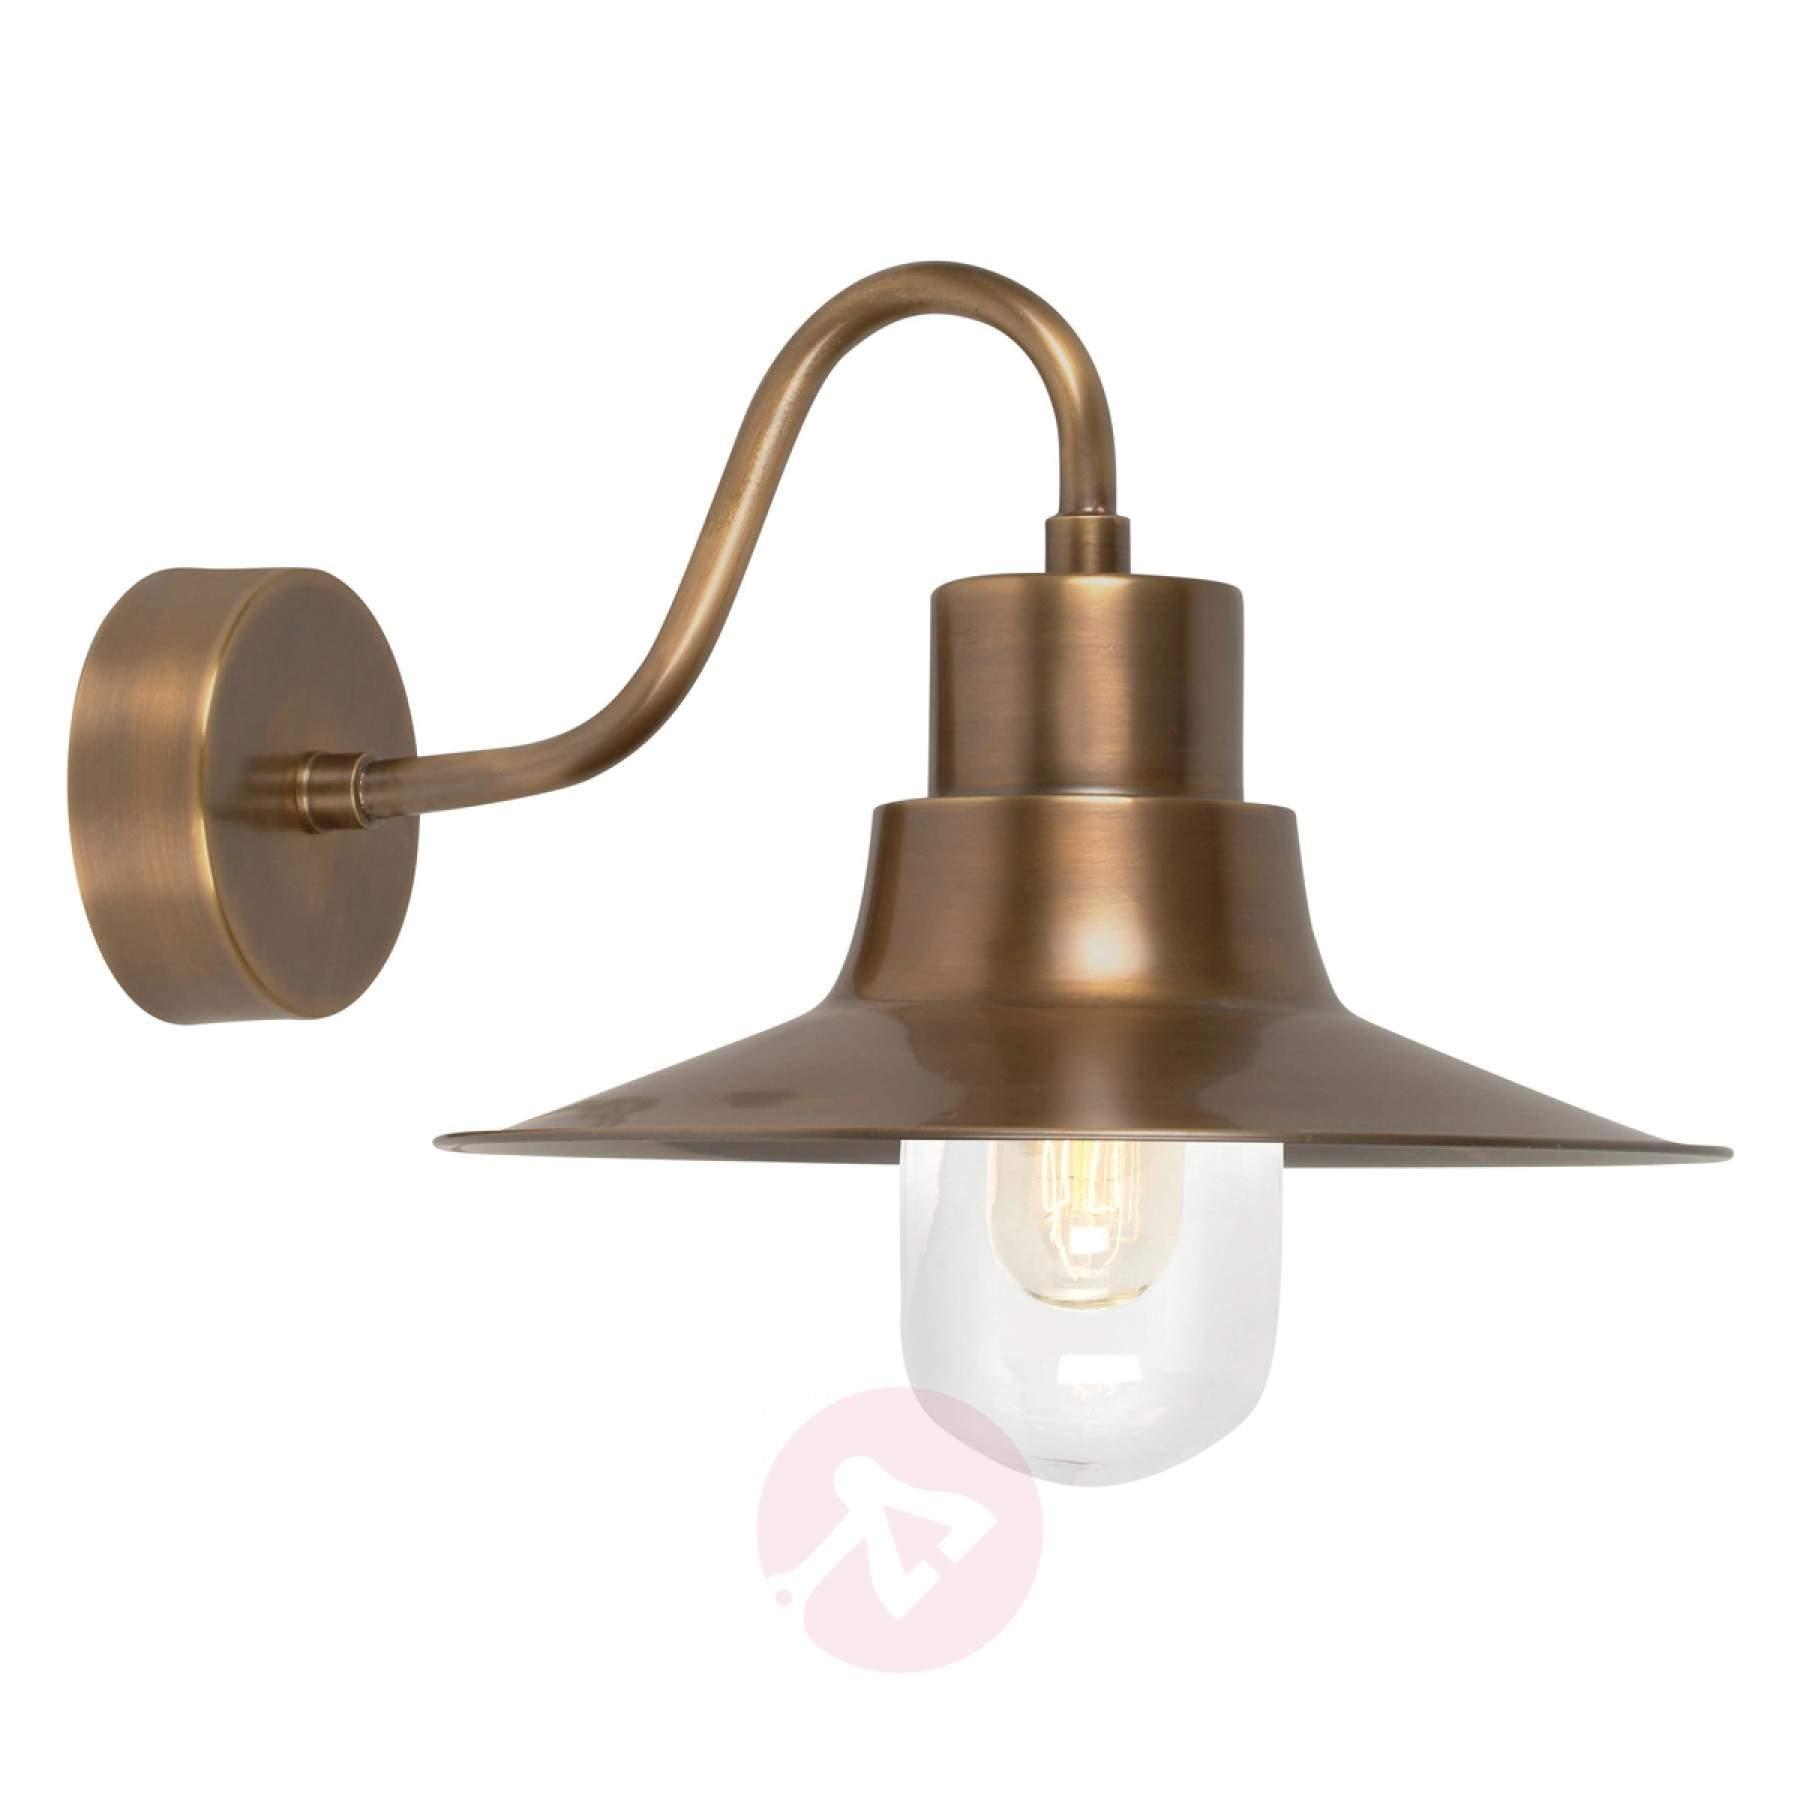 Brass Outdoor Wall Lamp Sheldon | Lights.co (#6 of 15)